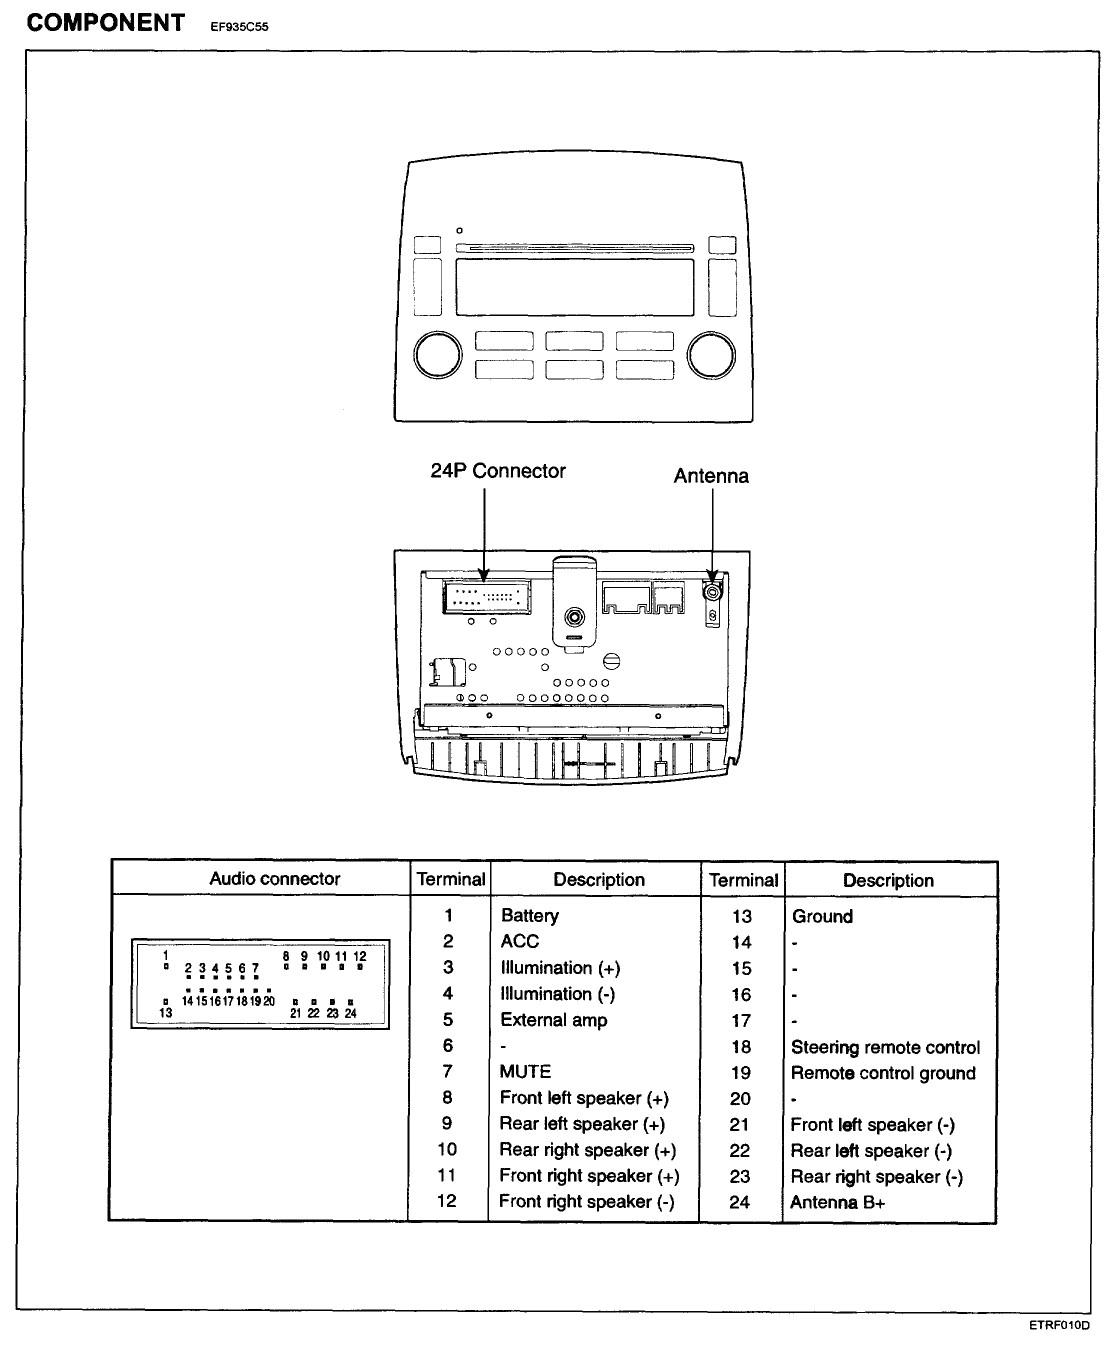 hyundai sonata wiring harness diagram wiring diagram paperhyundai wiring harness diagram wiring diagram paper 2011 hyundai